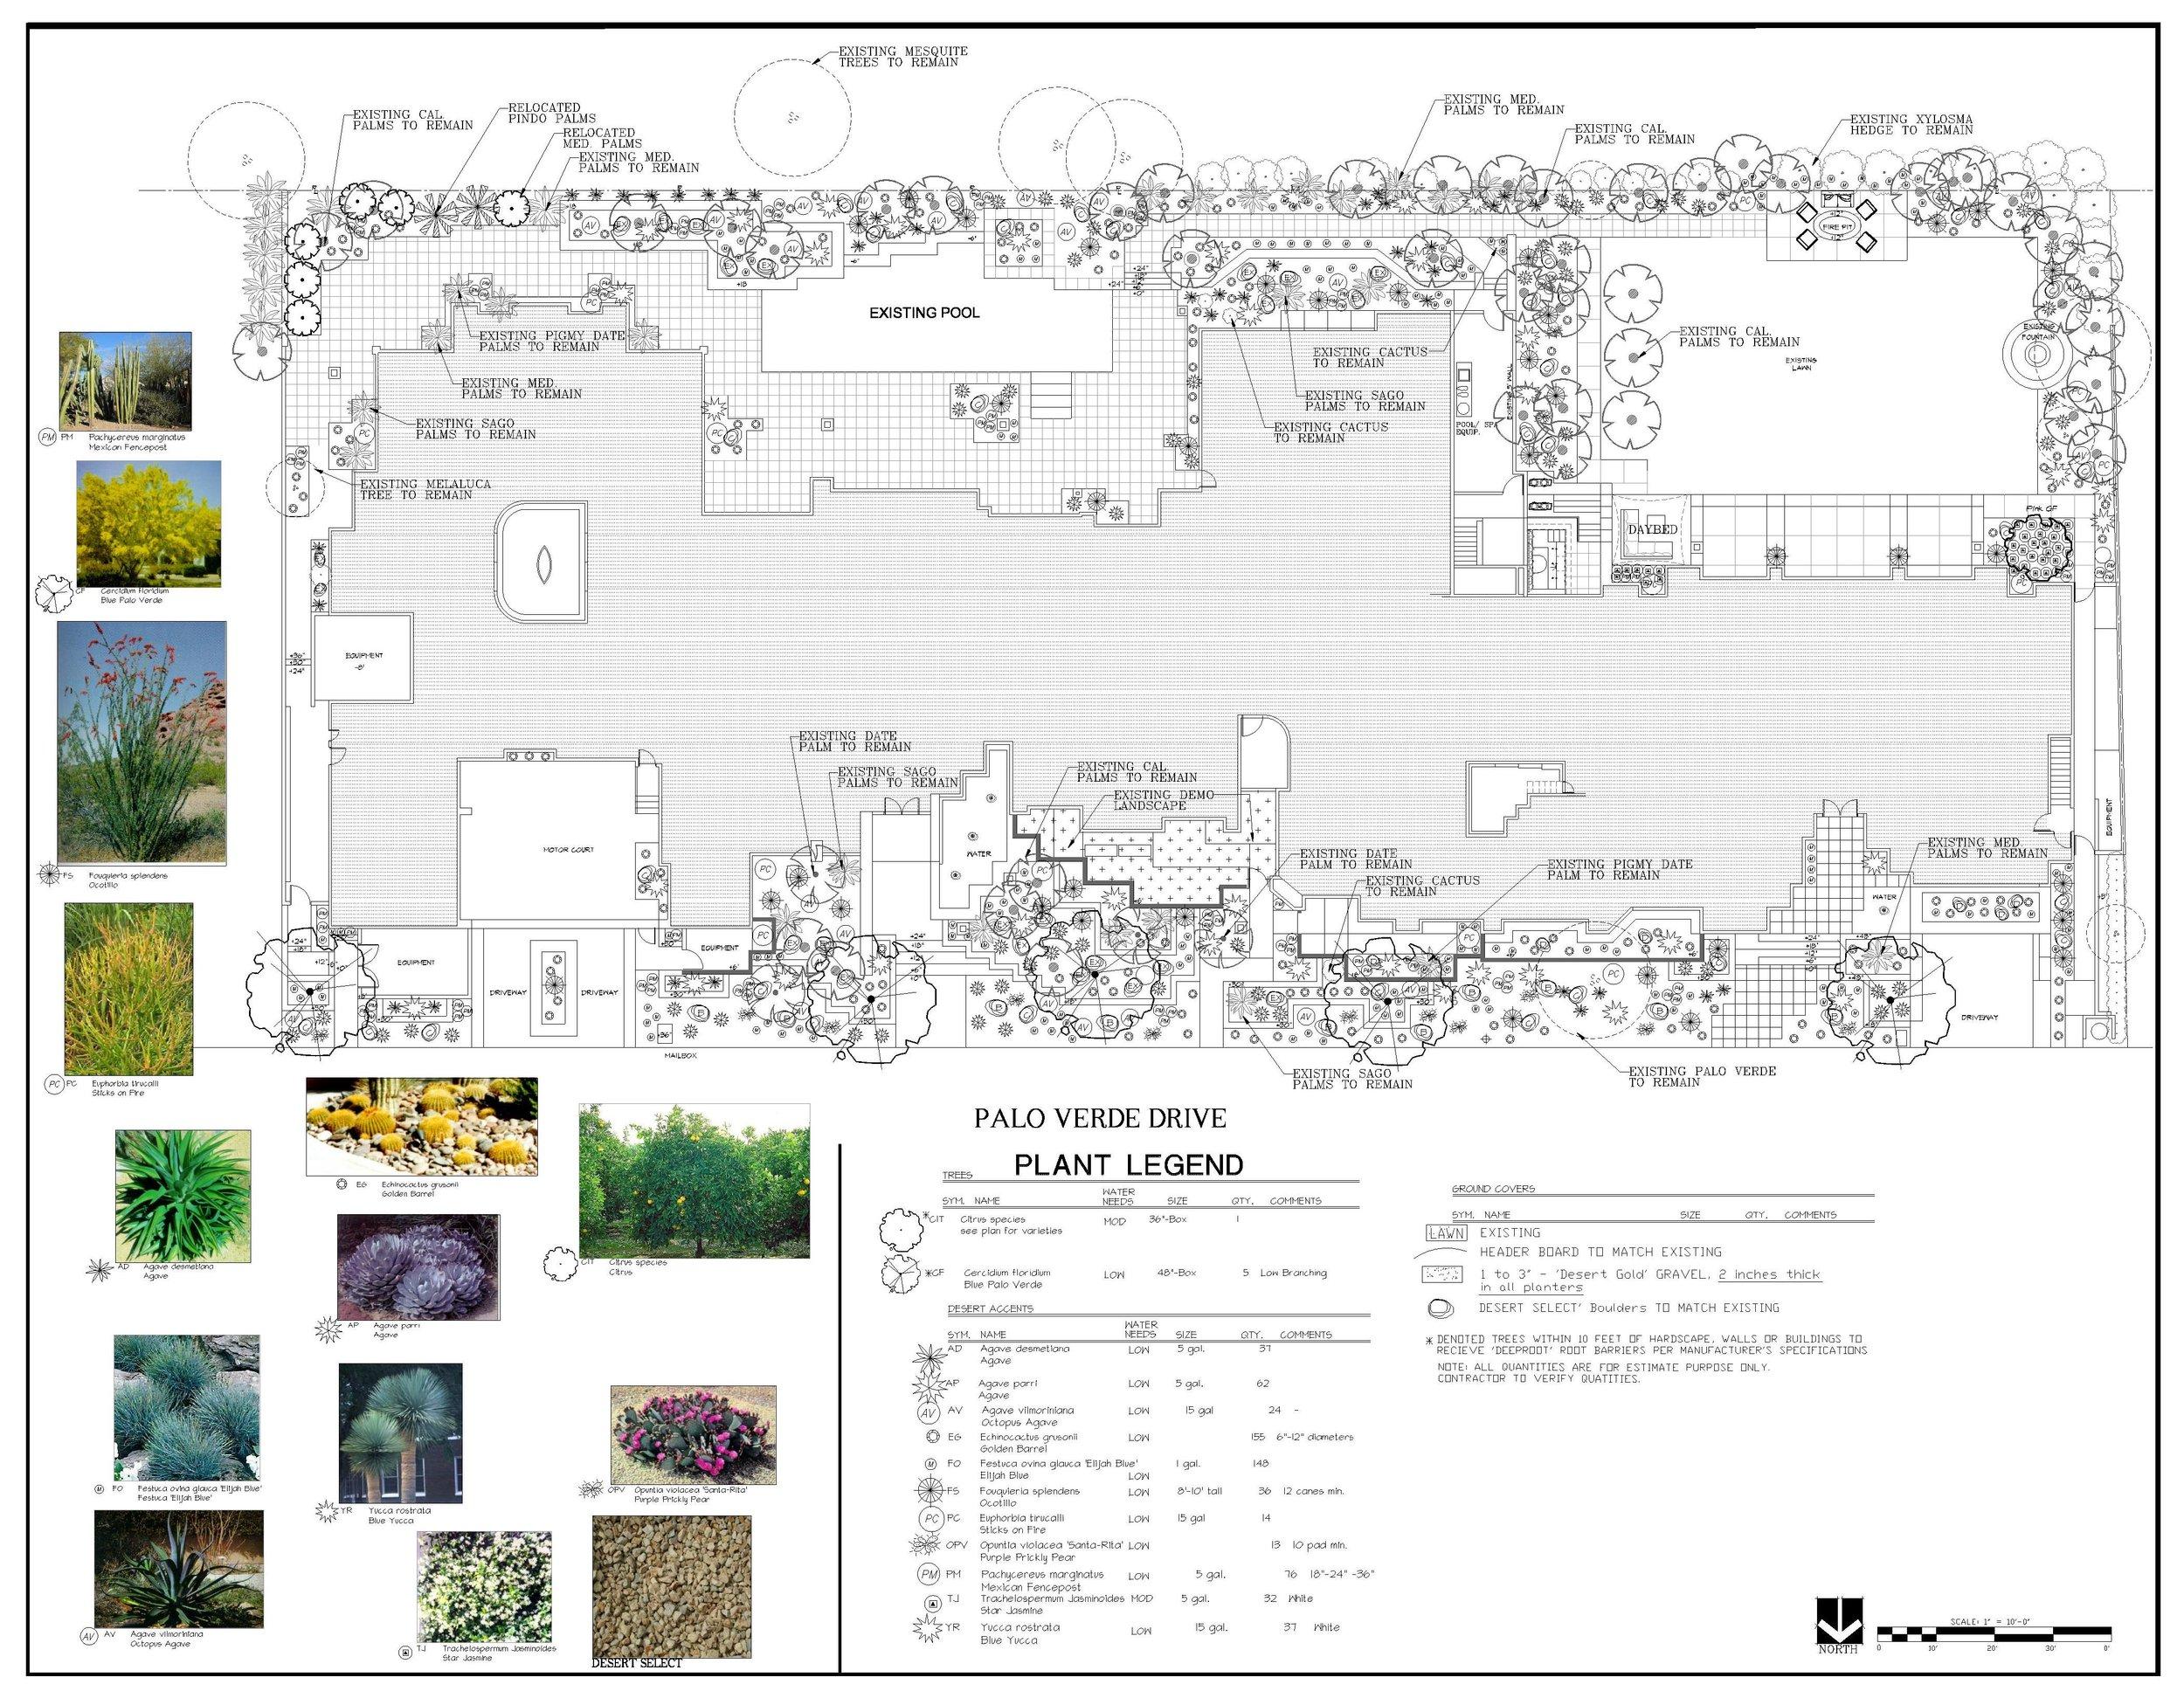 Landscape-74465PaloVerdeDrive.jpg